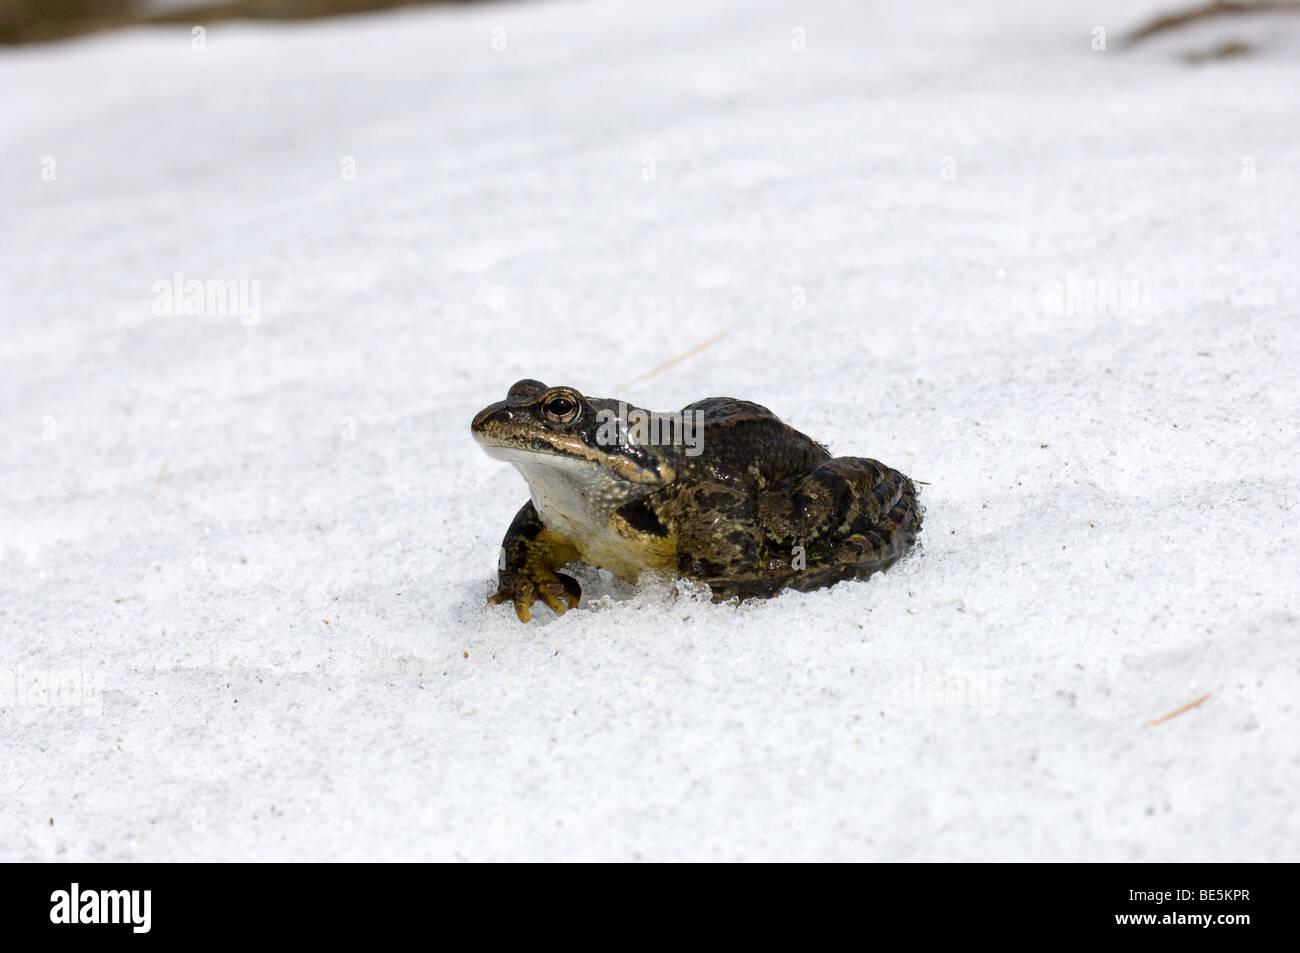 rana temporaria anfibi anuri sangue freddo kaltbl tig neve freddo inverno frosch schnee kalten. Black Bedroom Furniture Sets. Home Design Ideas